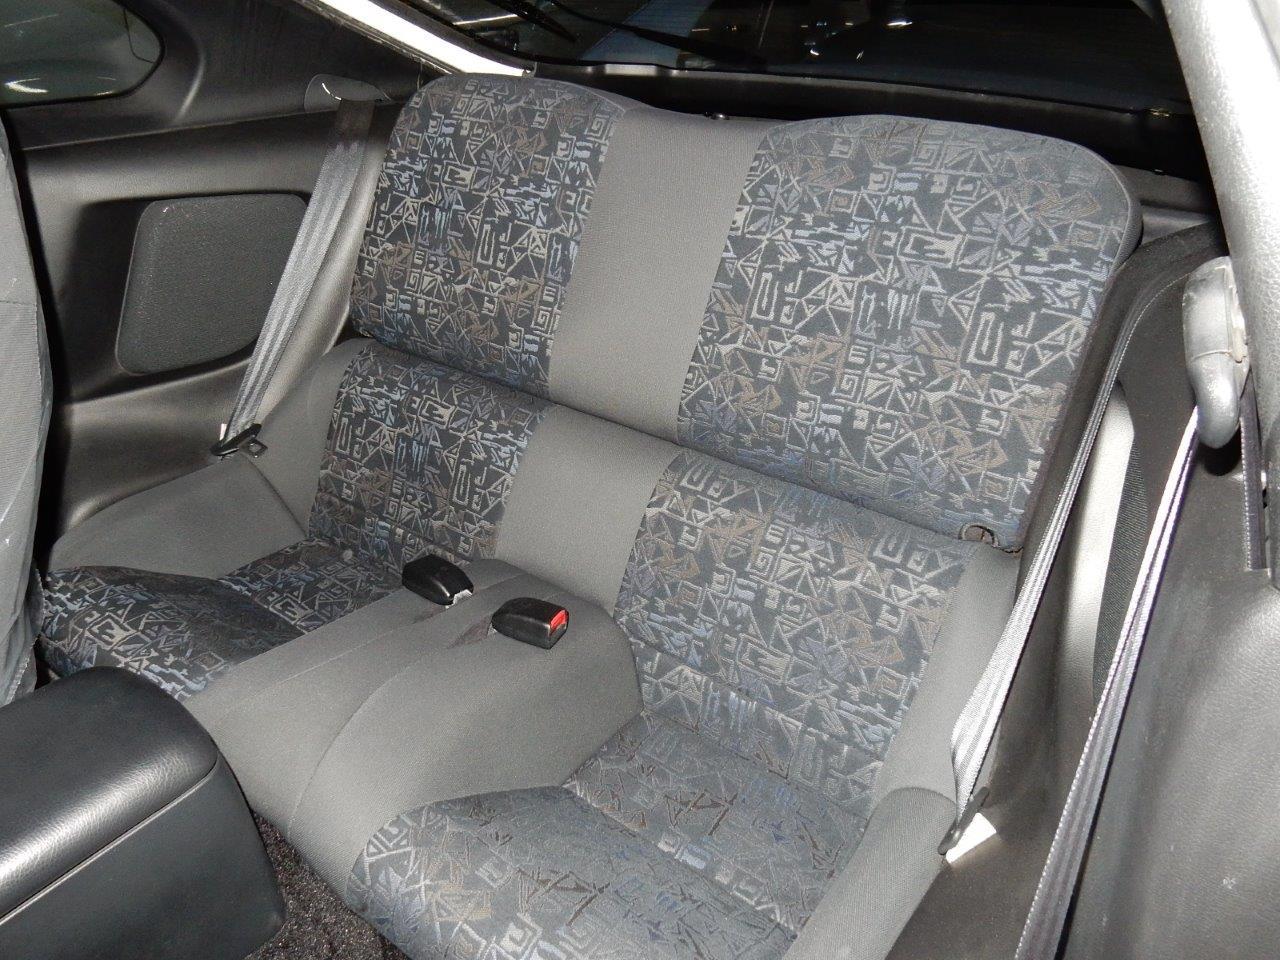 1998 Toyota Supra SZ AEROTOP back seat